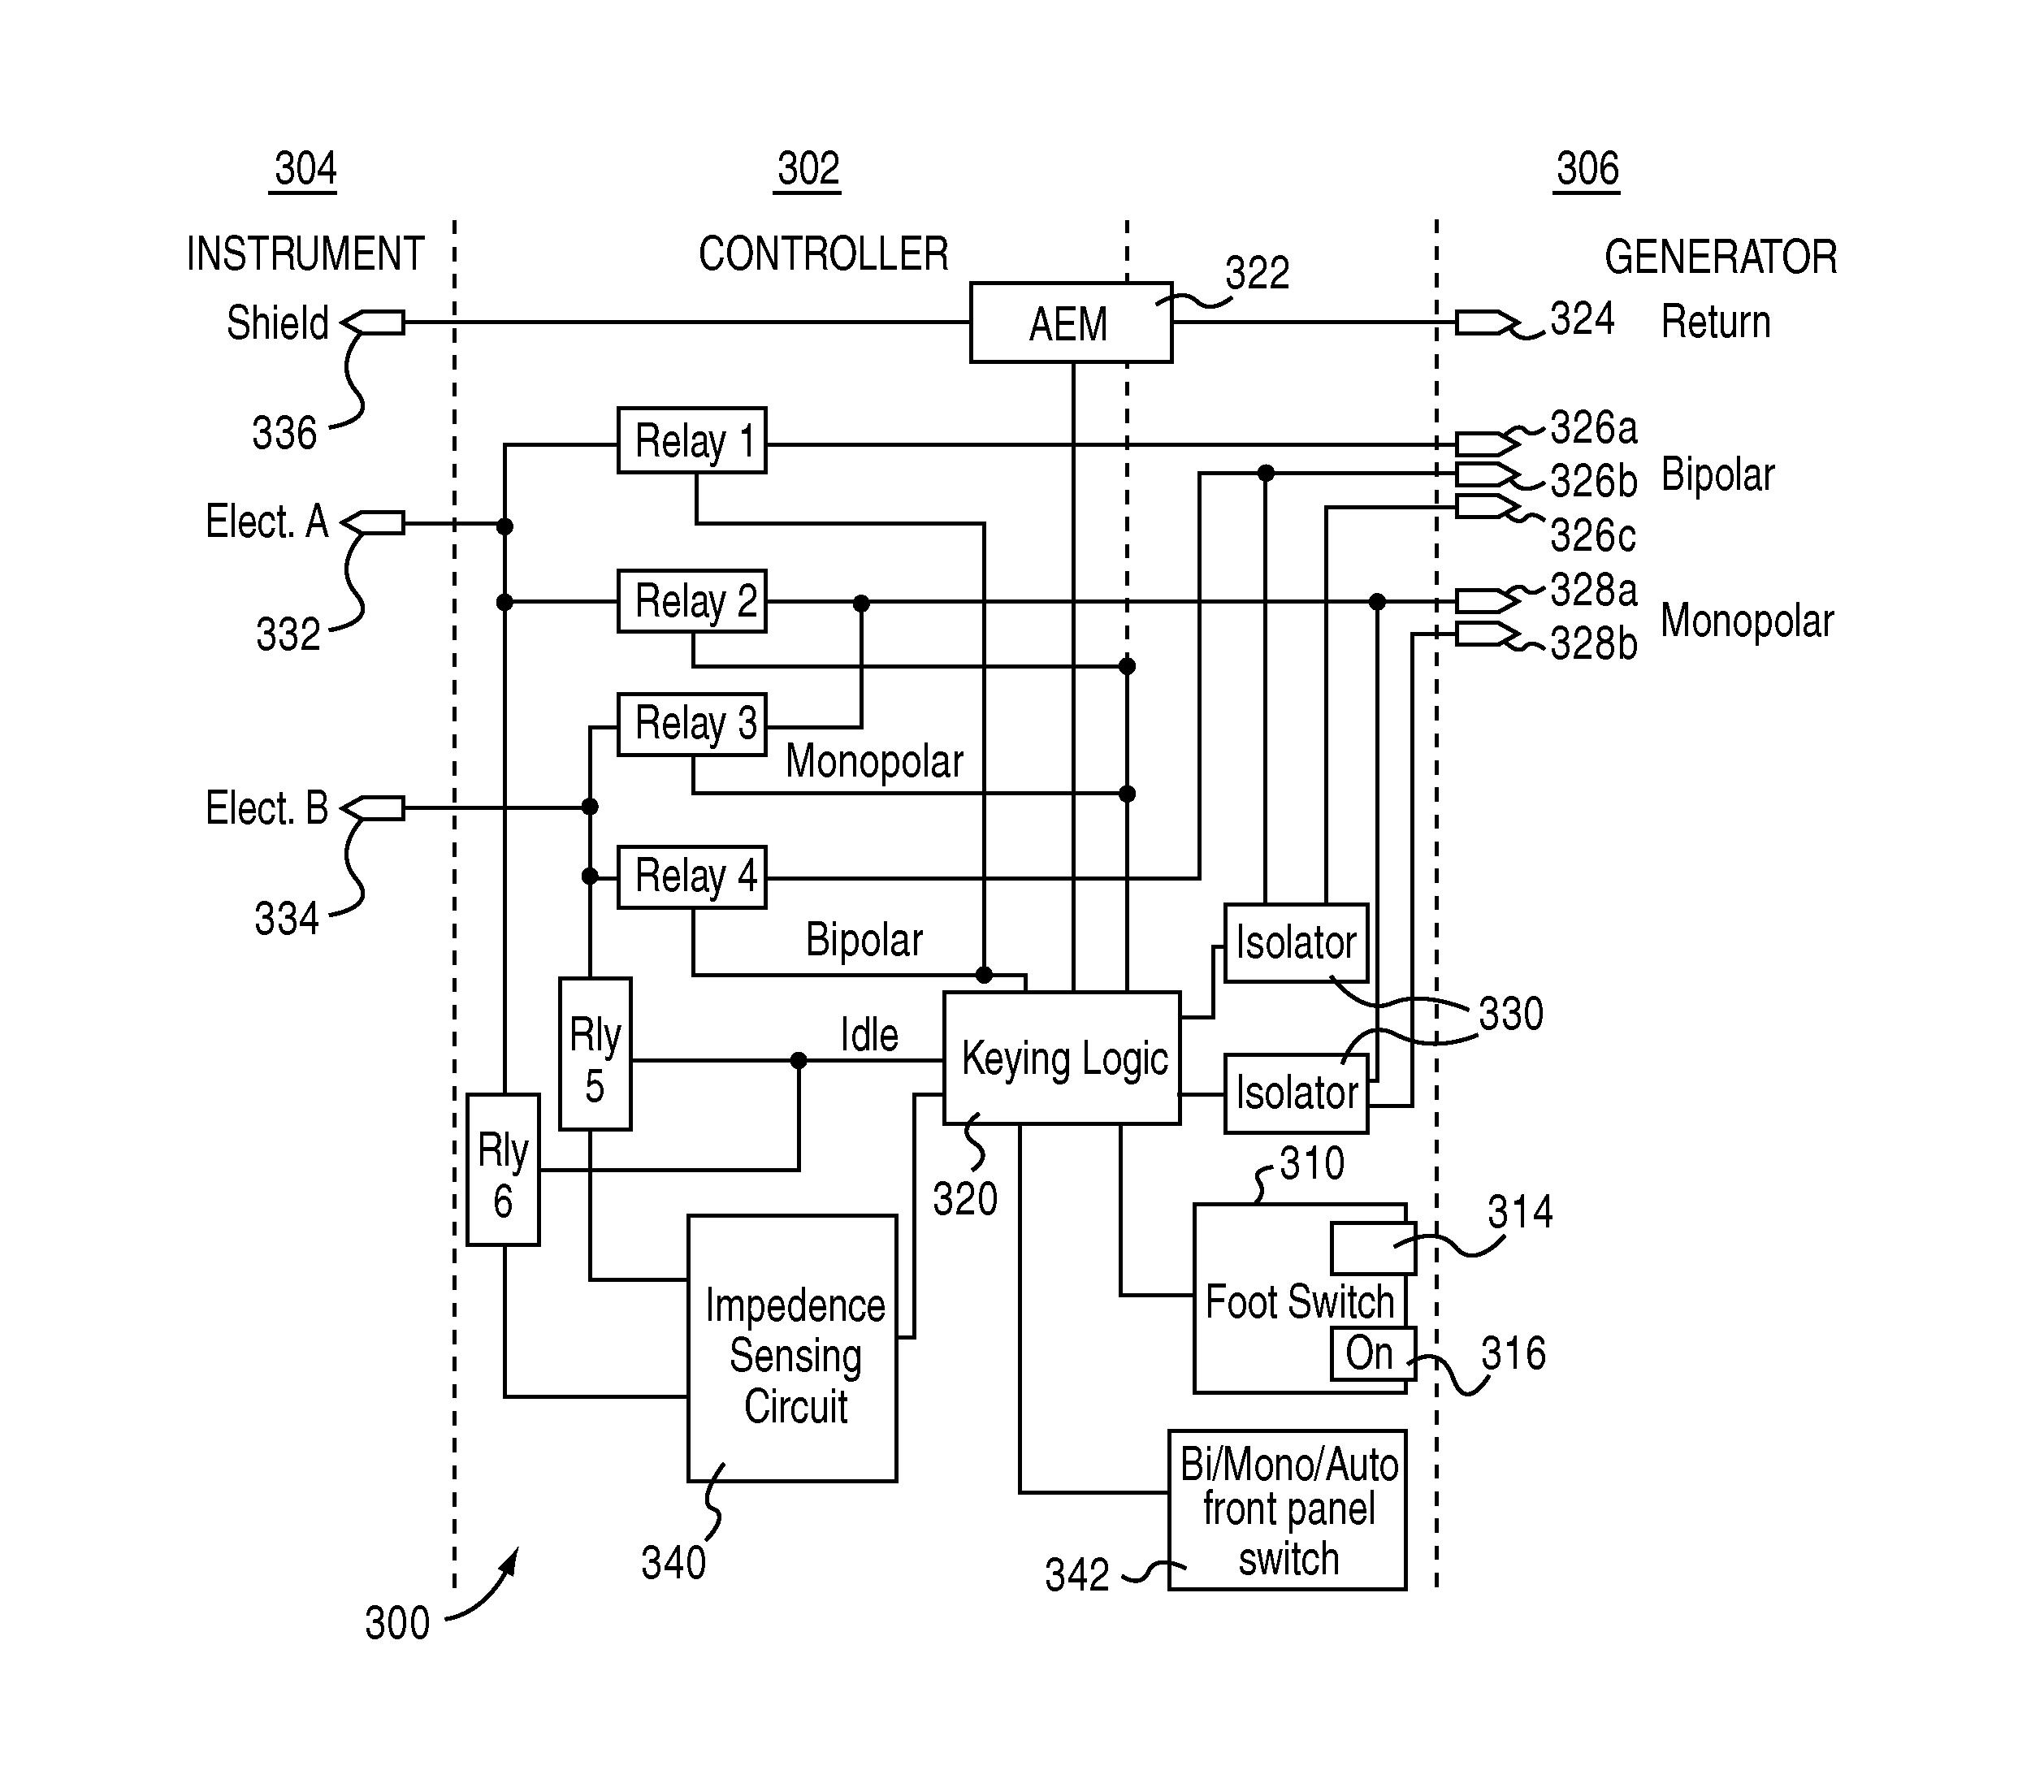 Emerson Electric Motor Diagram